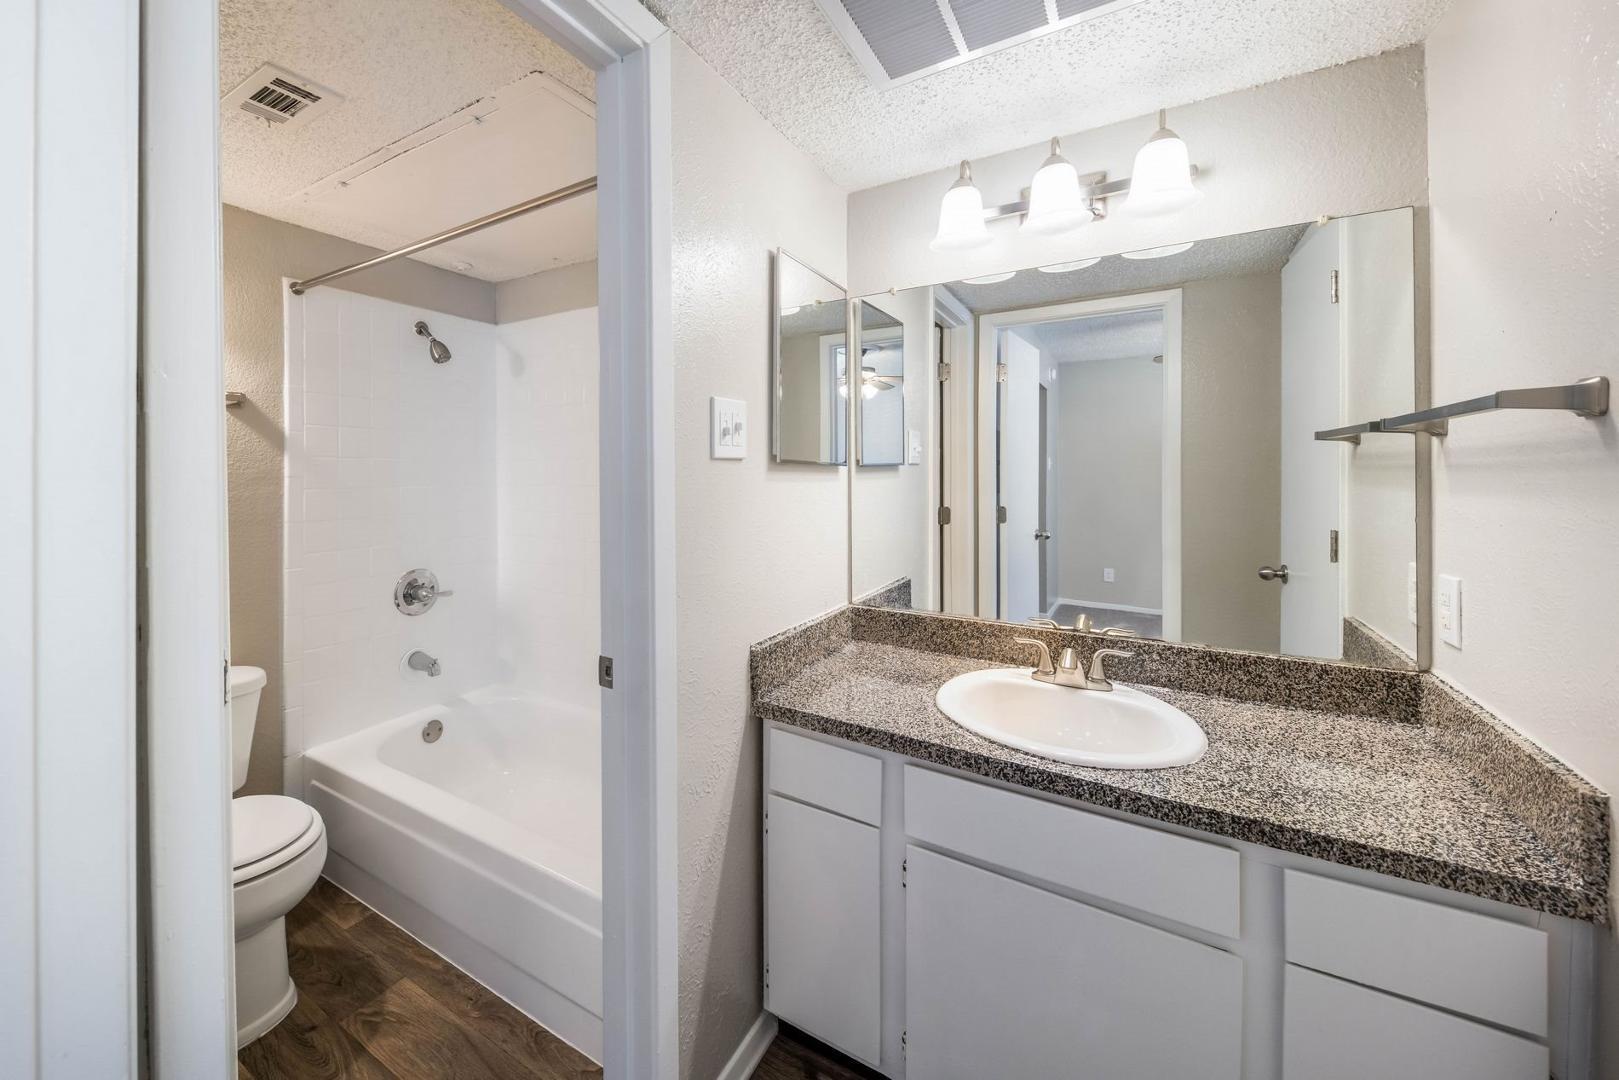 1679 Sotogrande Boulevard #0303, Euless, TX - 904 USD/ month